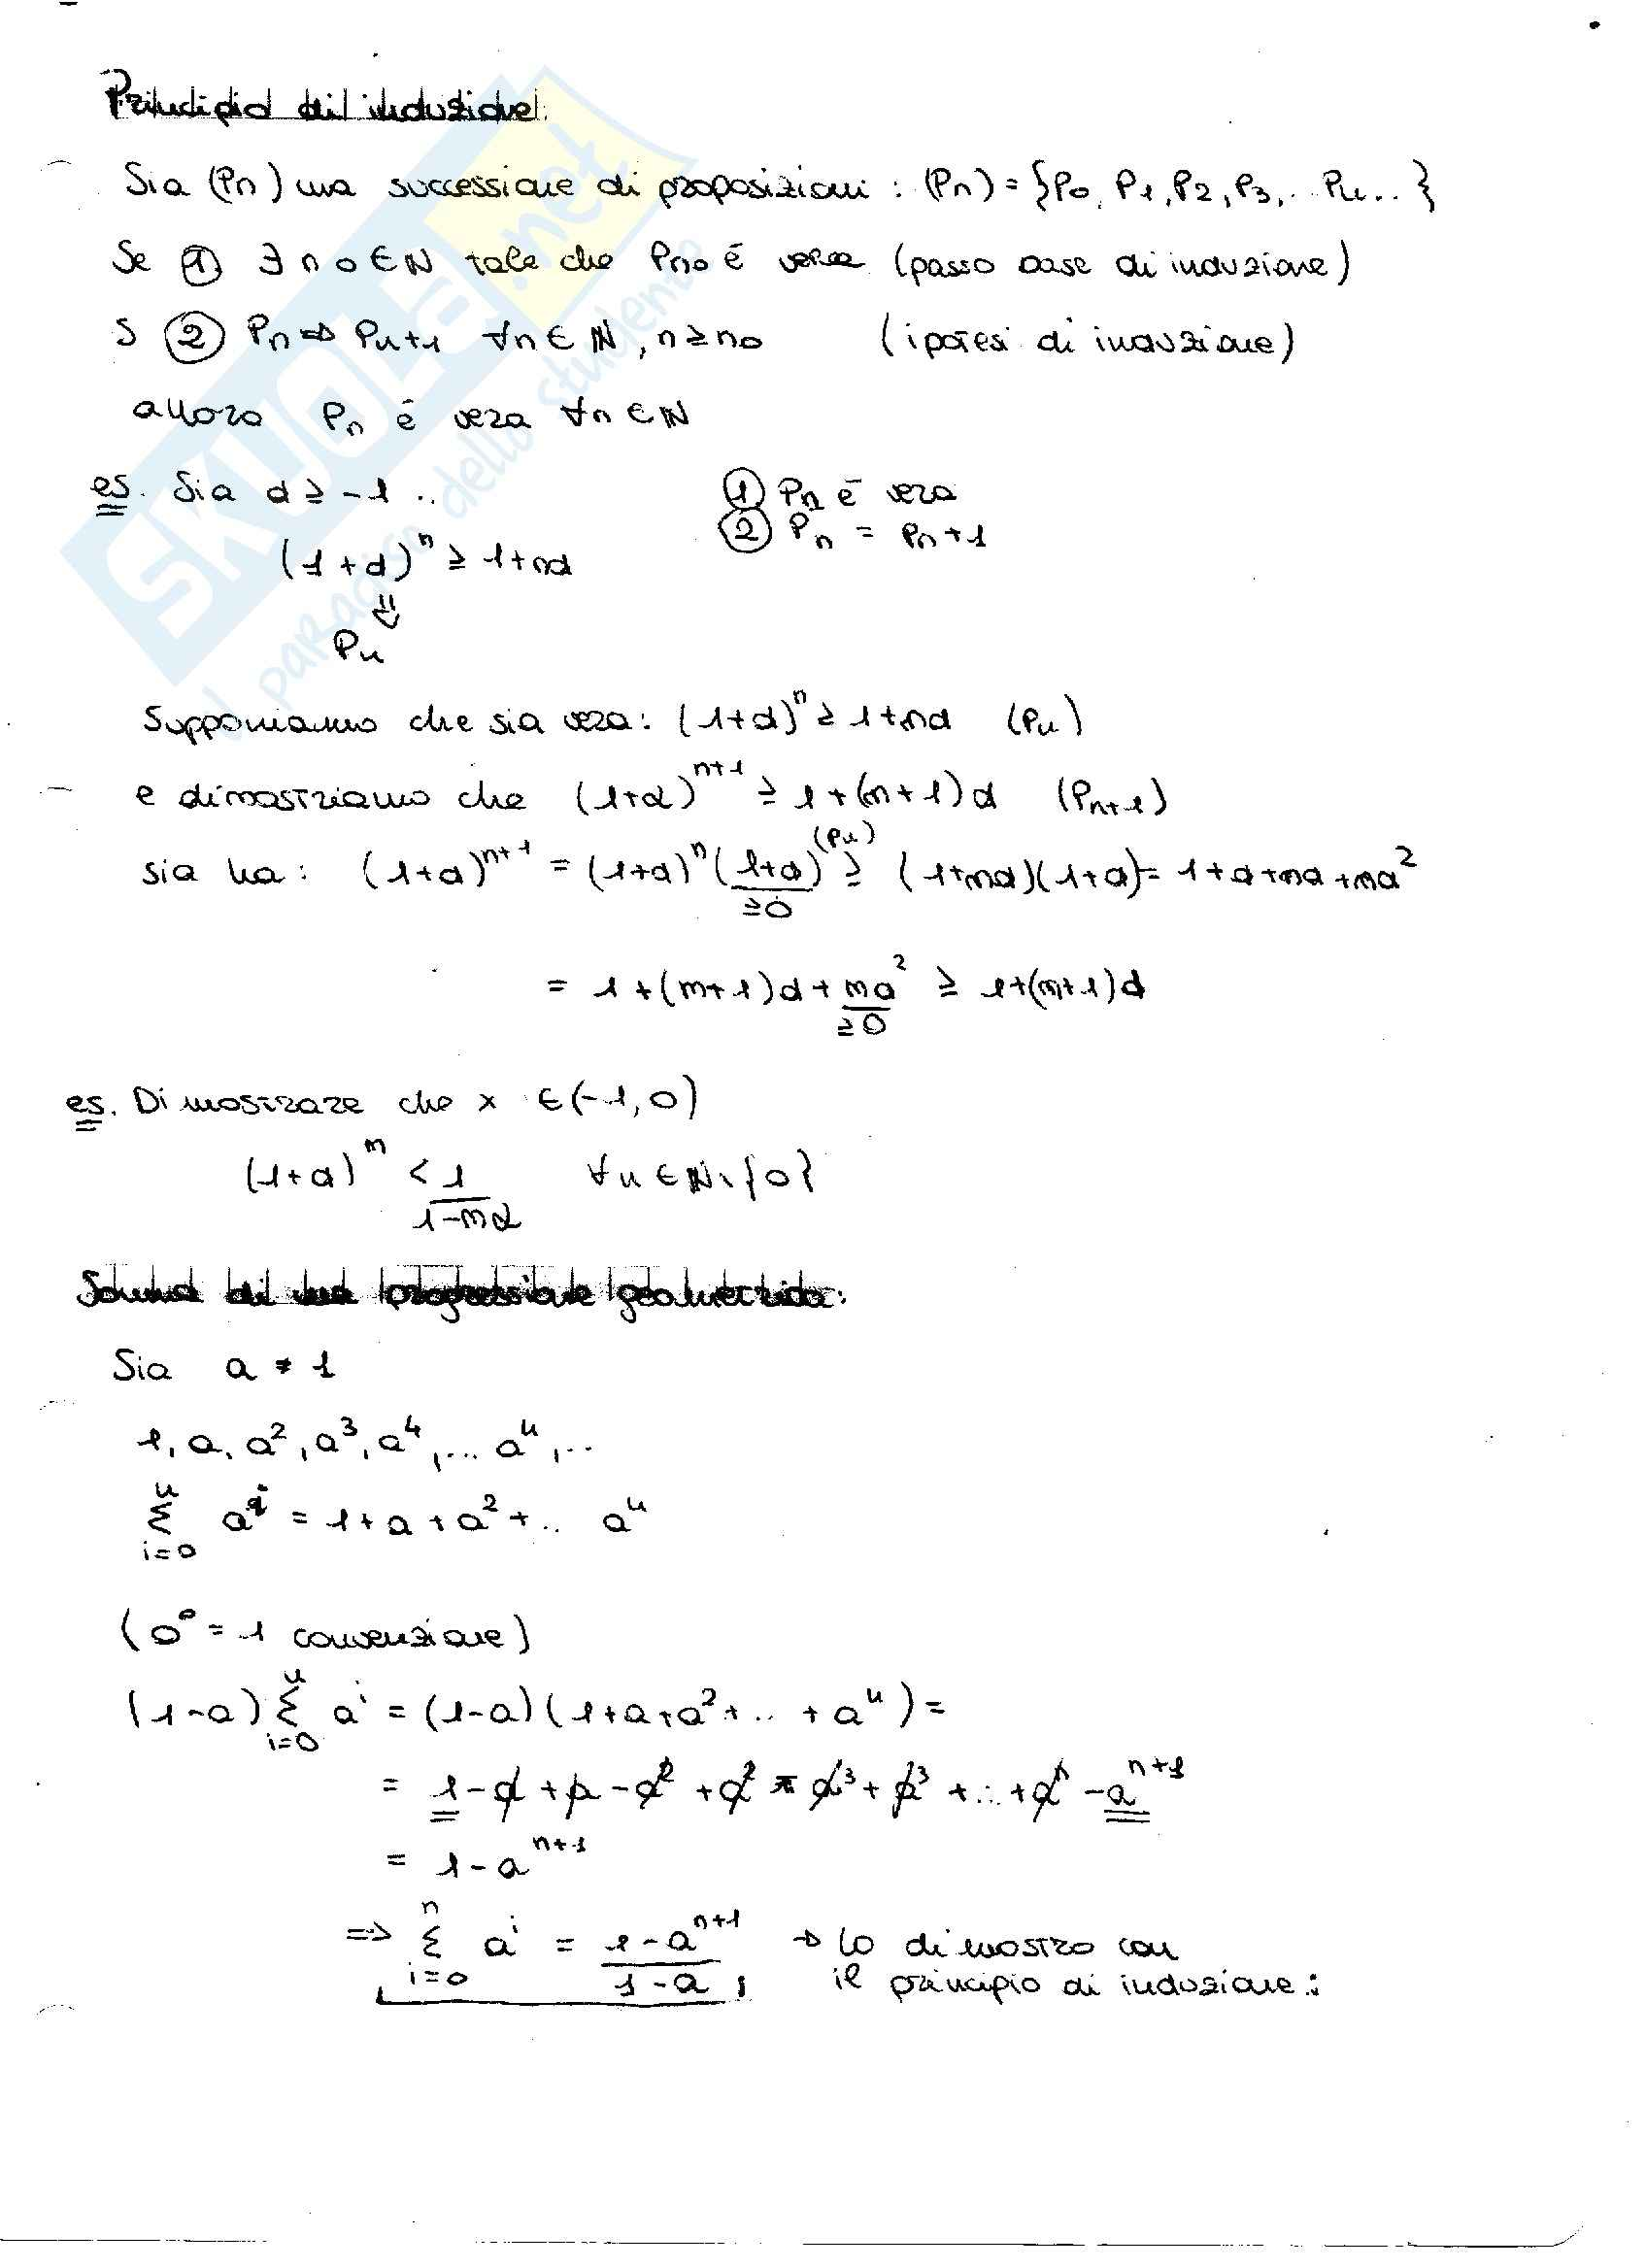 Principio di induzione e derivate: Appunti di Analisi matematica